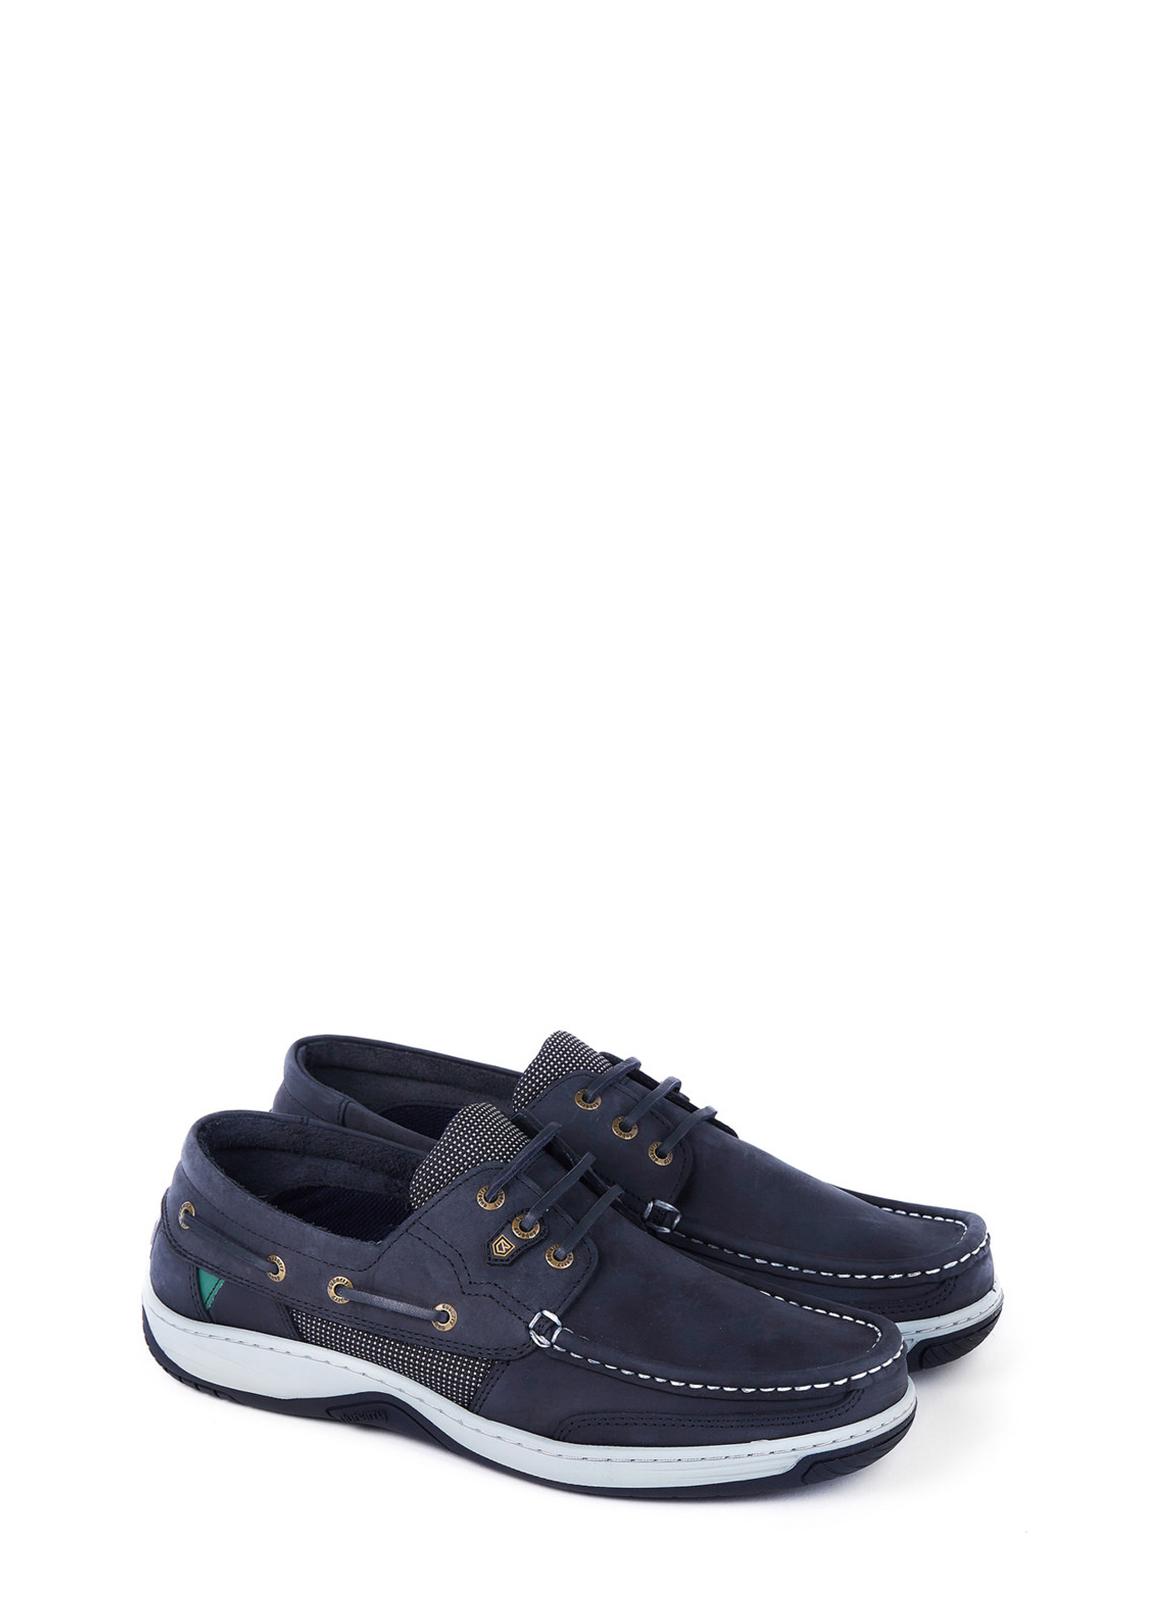 Regatta ExtraFit™ Deck Shoe - Navy